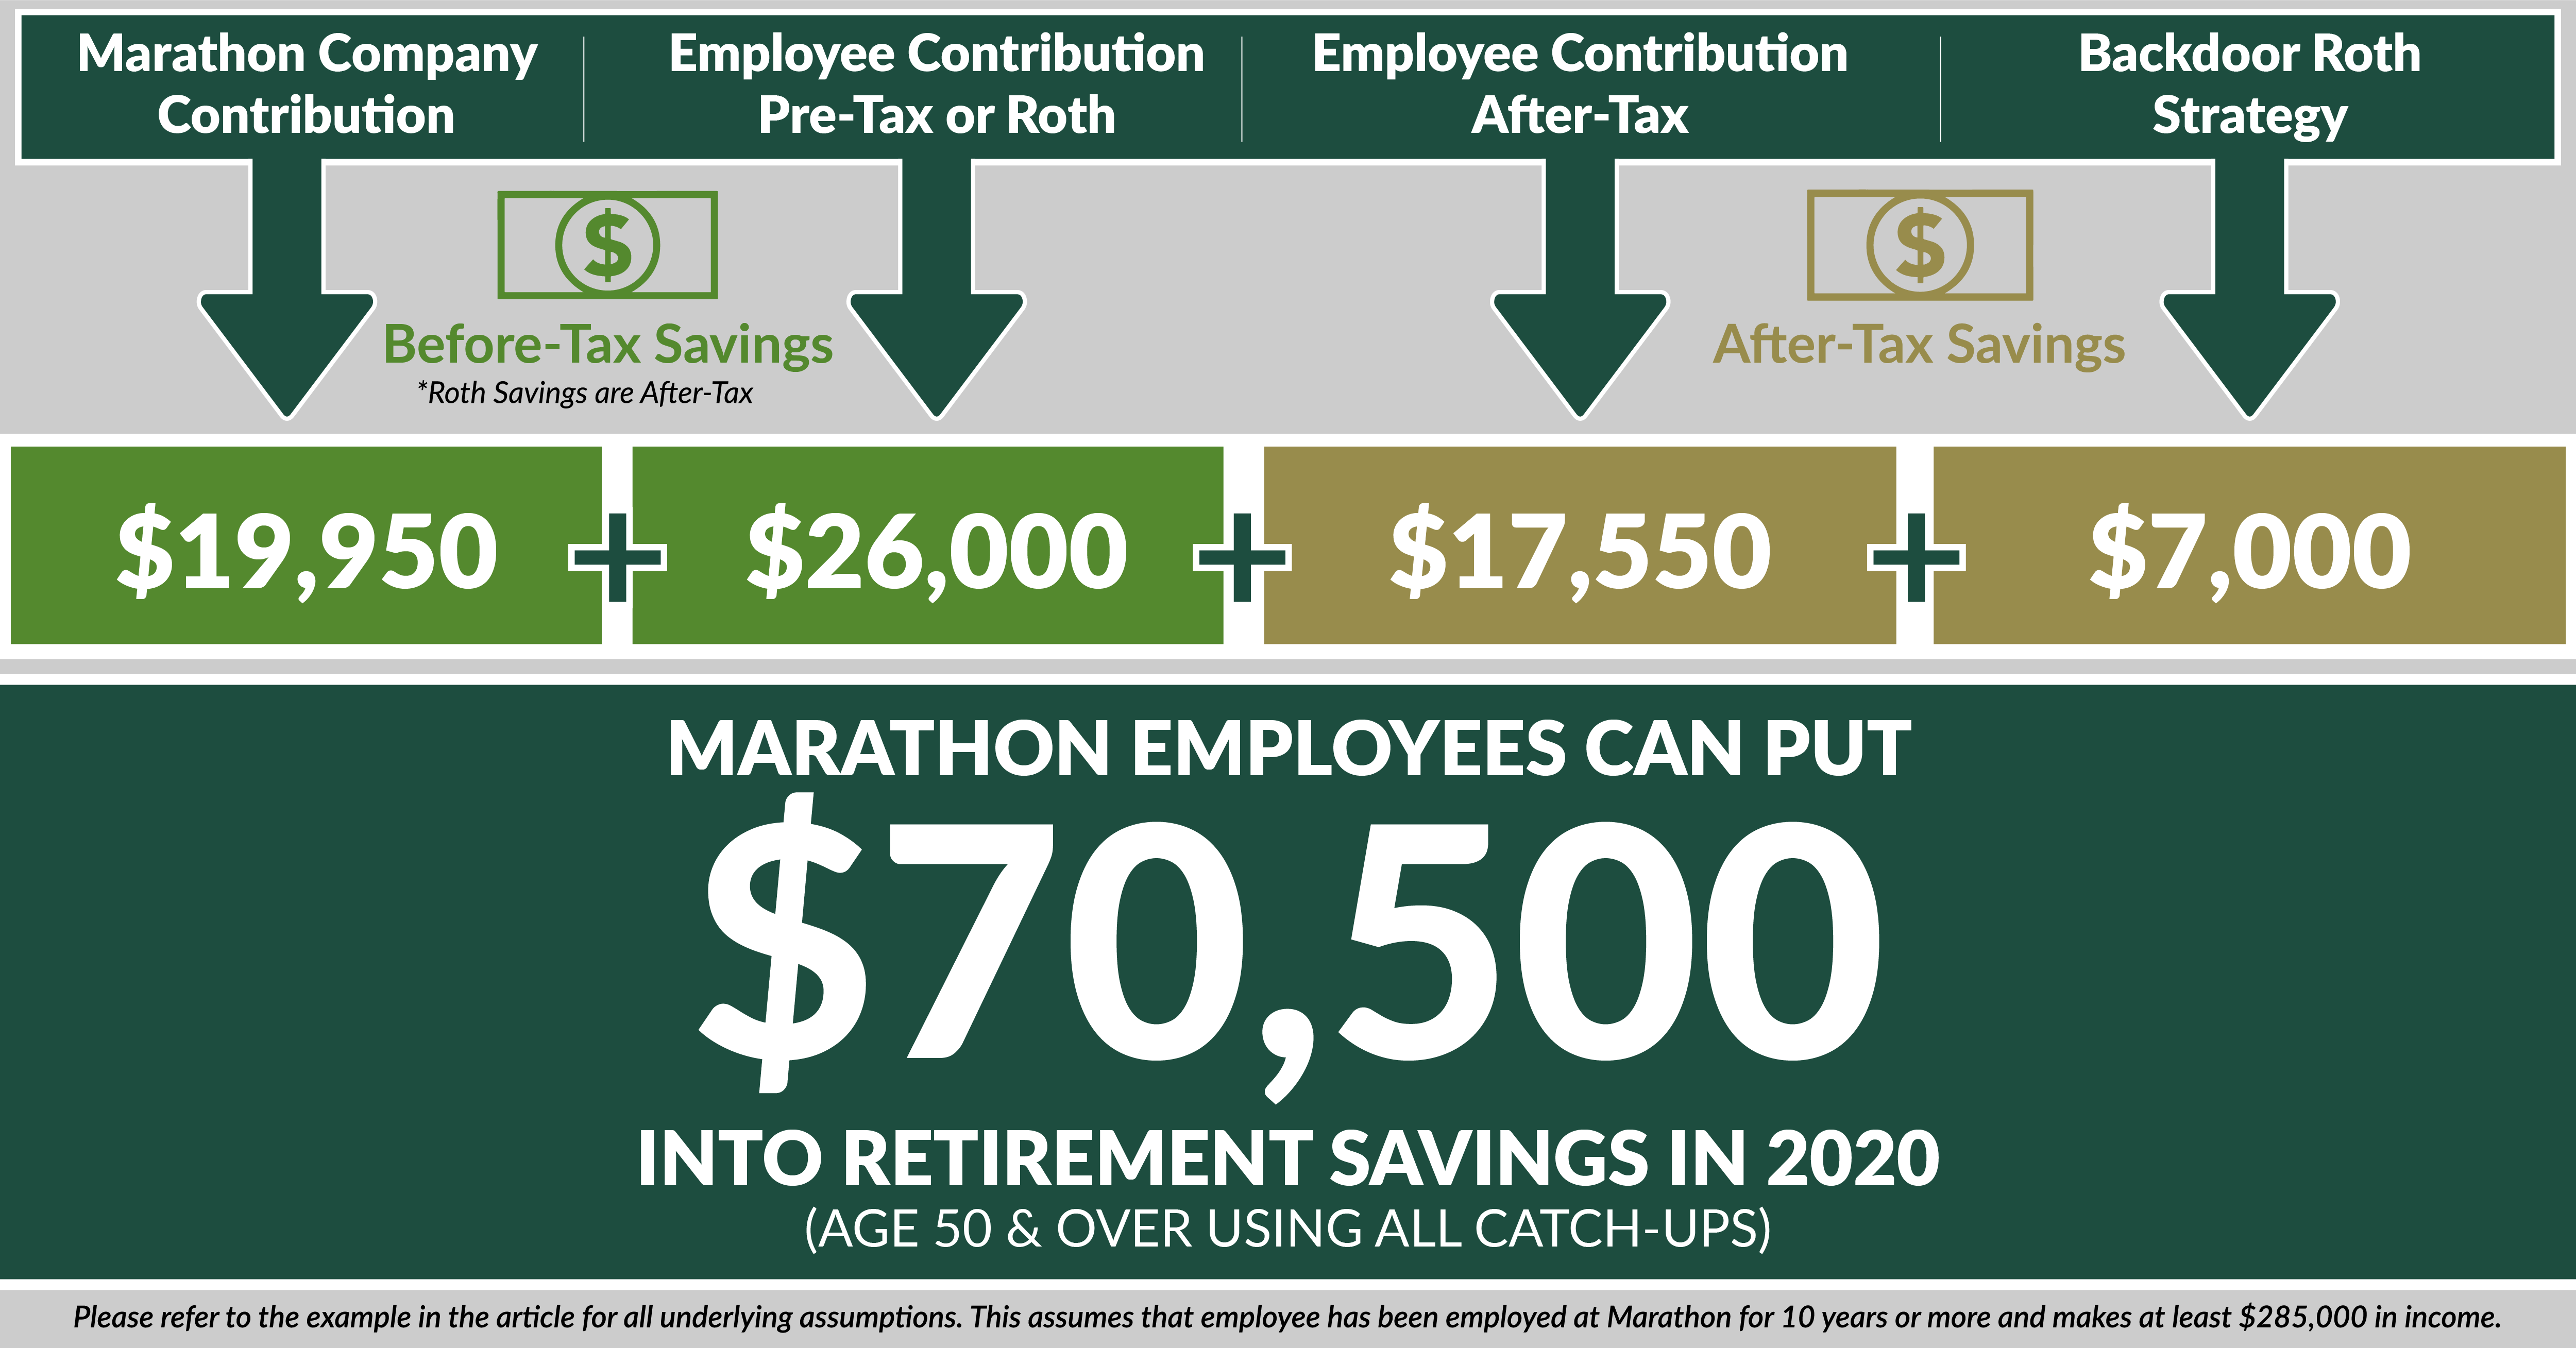 2020 retirement savings contribution limits-Marathon